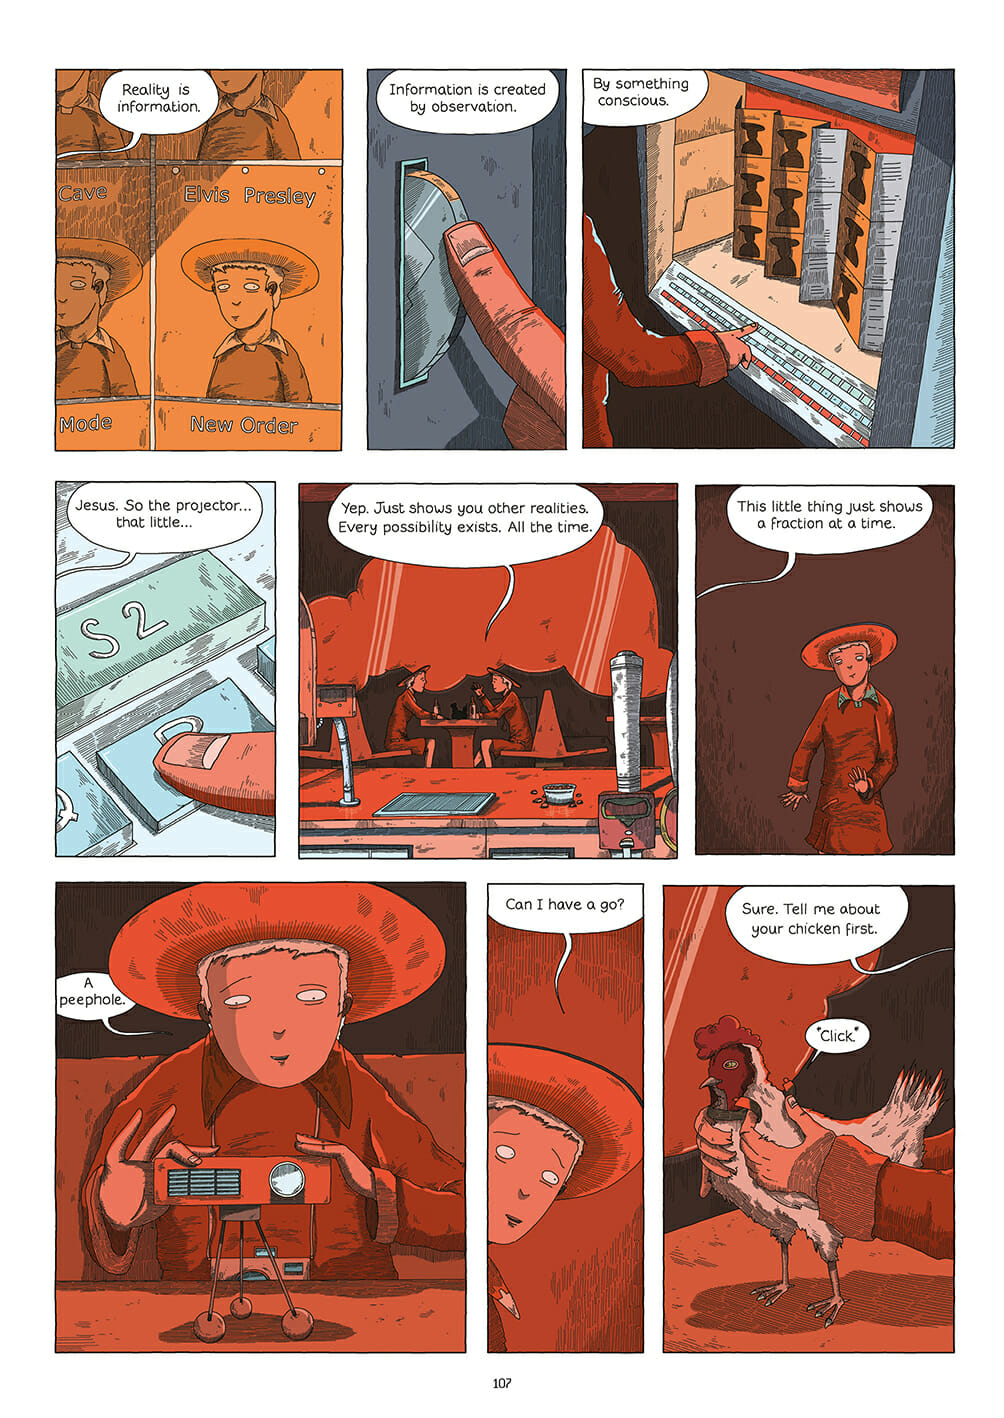 Julian Hanshaw - Be Little With Me - I Feel Machine